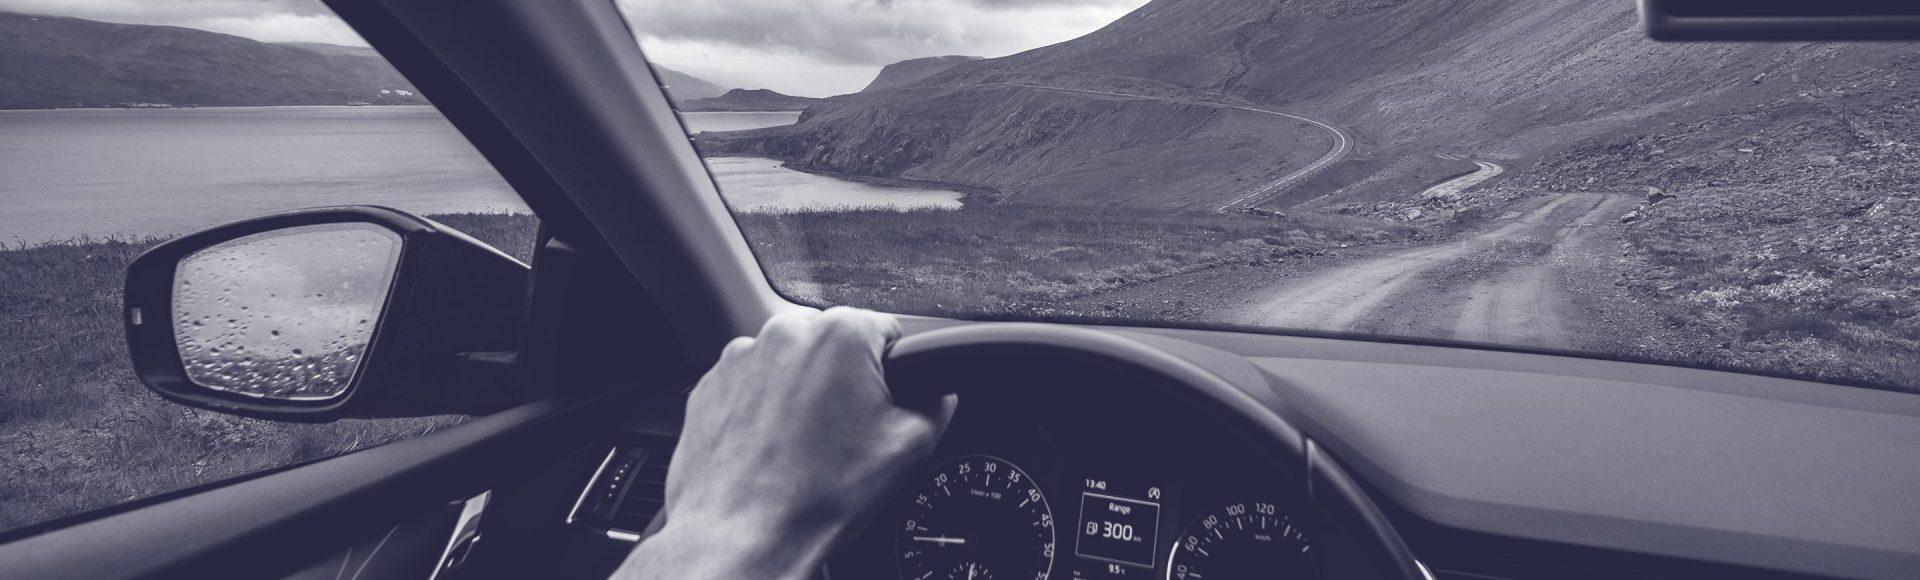 ARK-Invest_Blog-Banner_2014_03_31---Zipcar